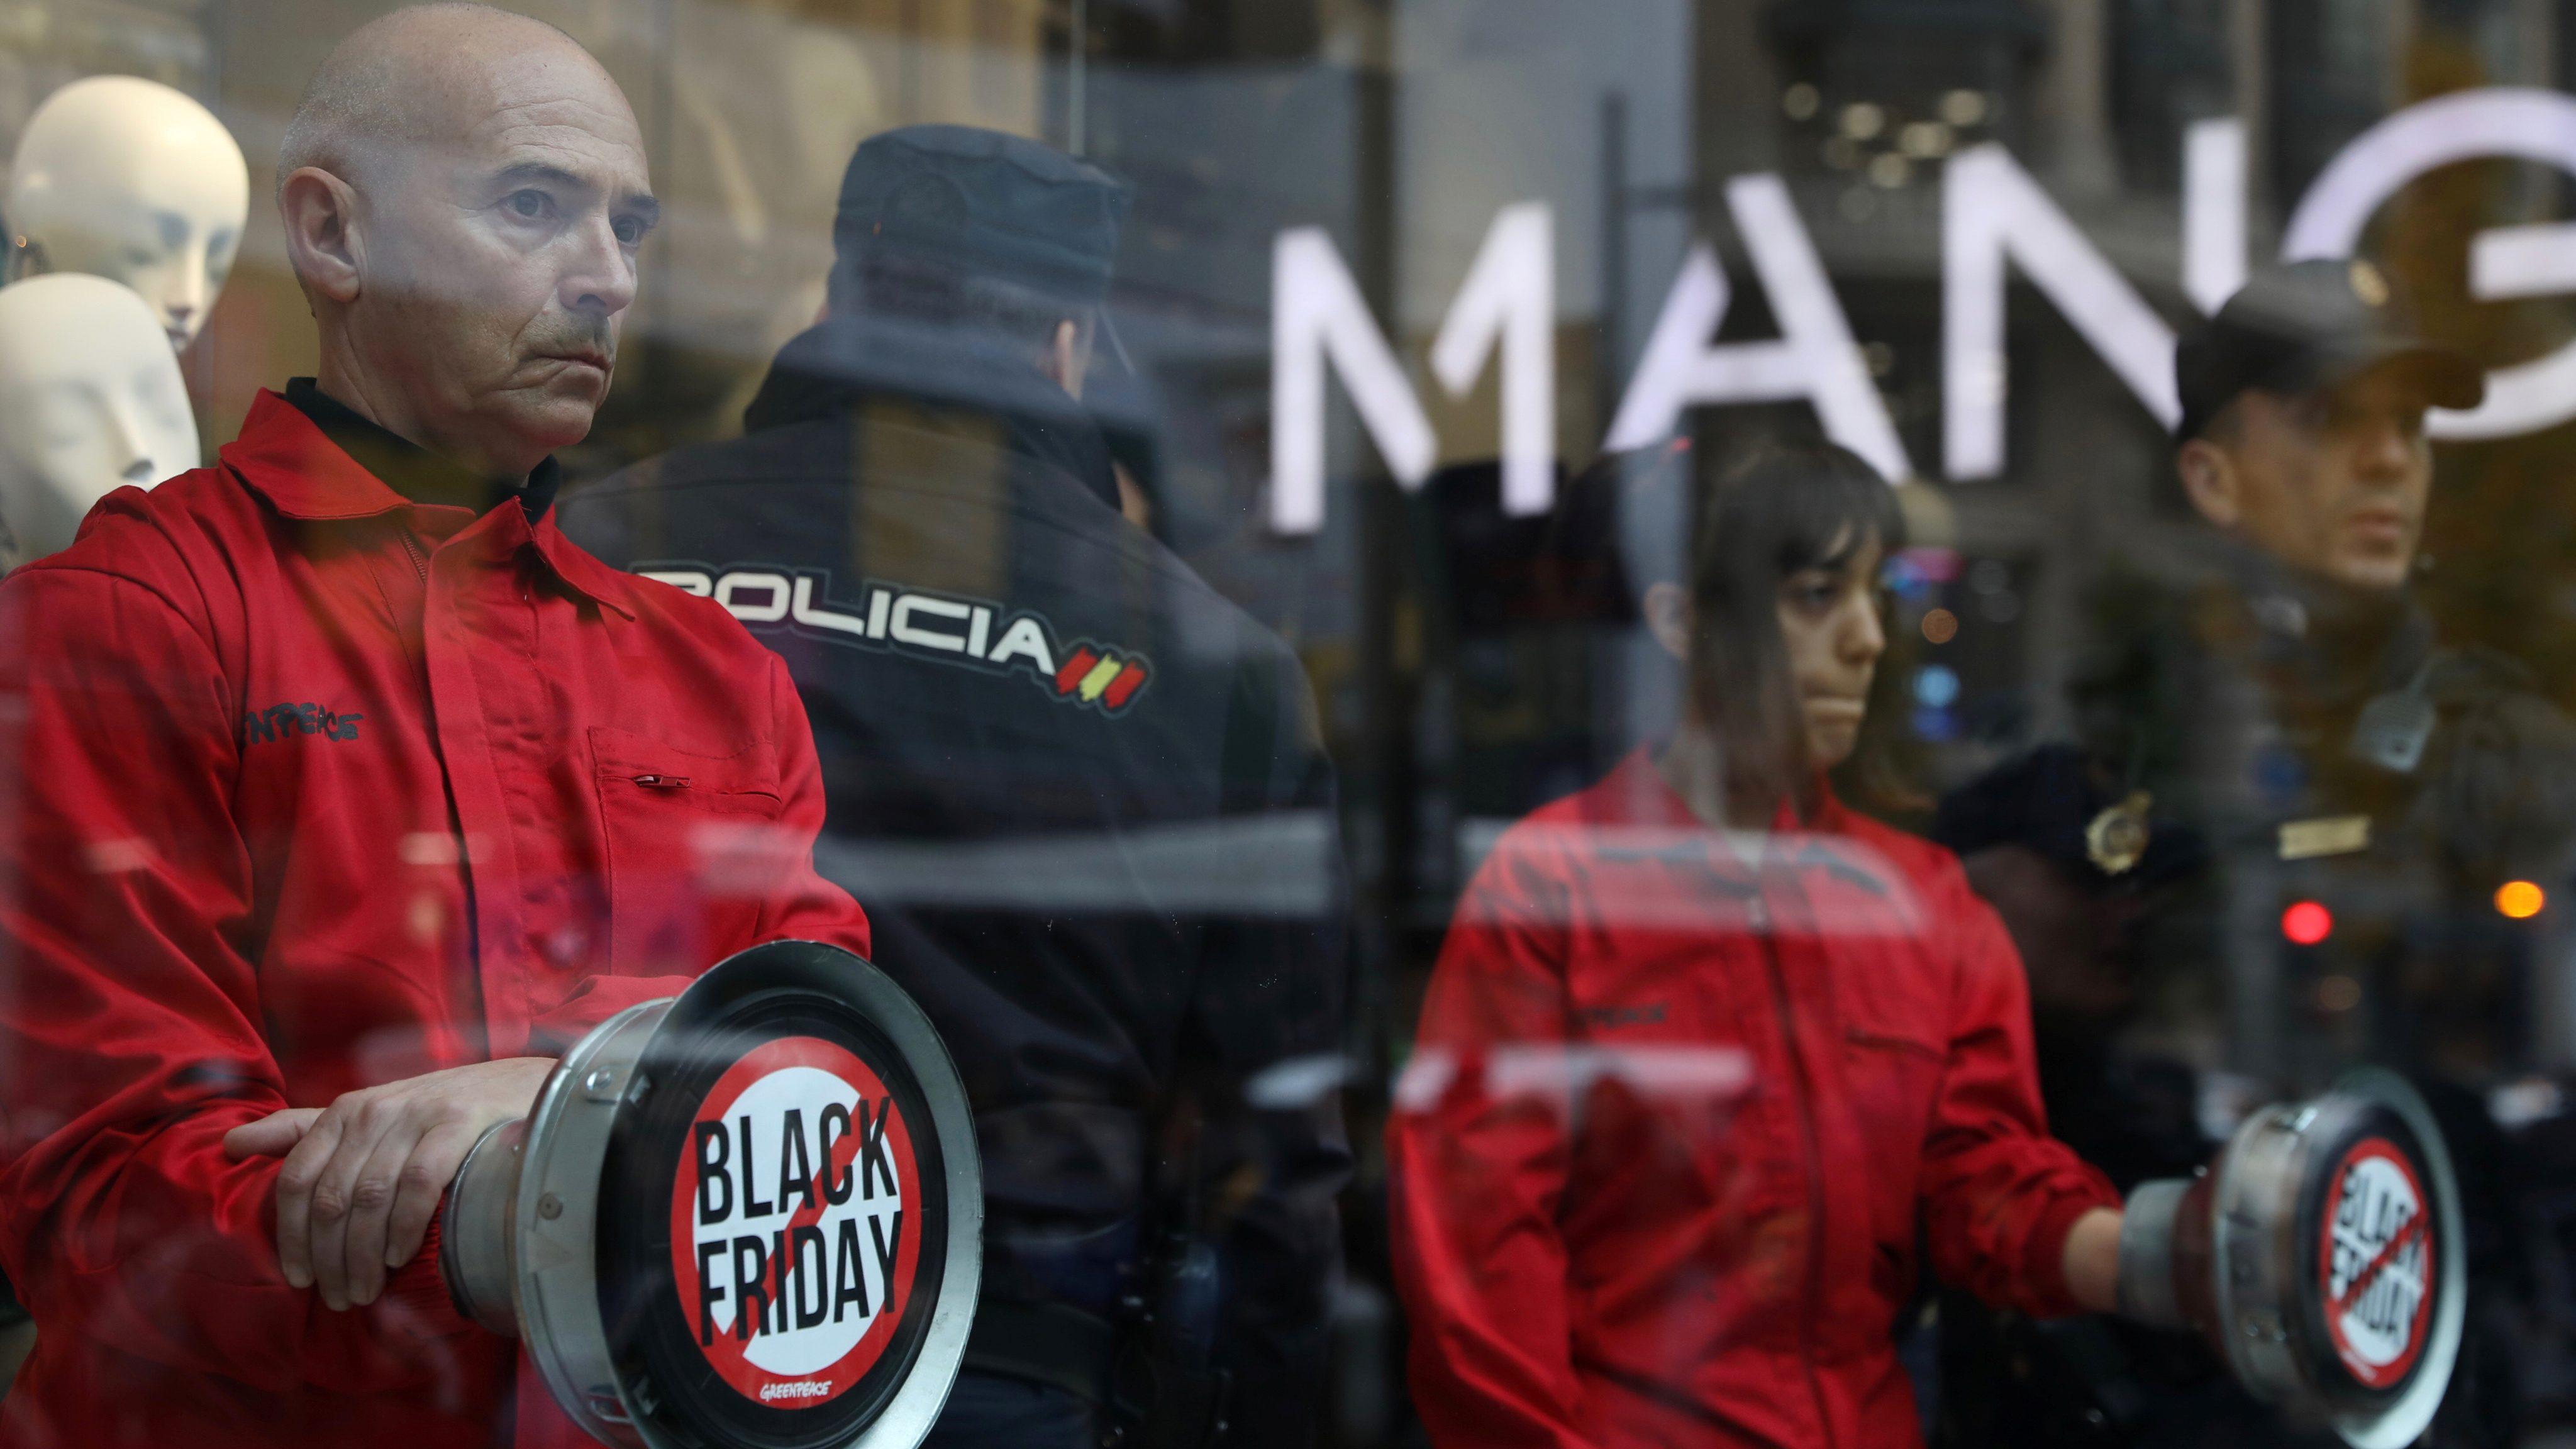 Greenpeace activists protest Black Friday inside a Mango store